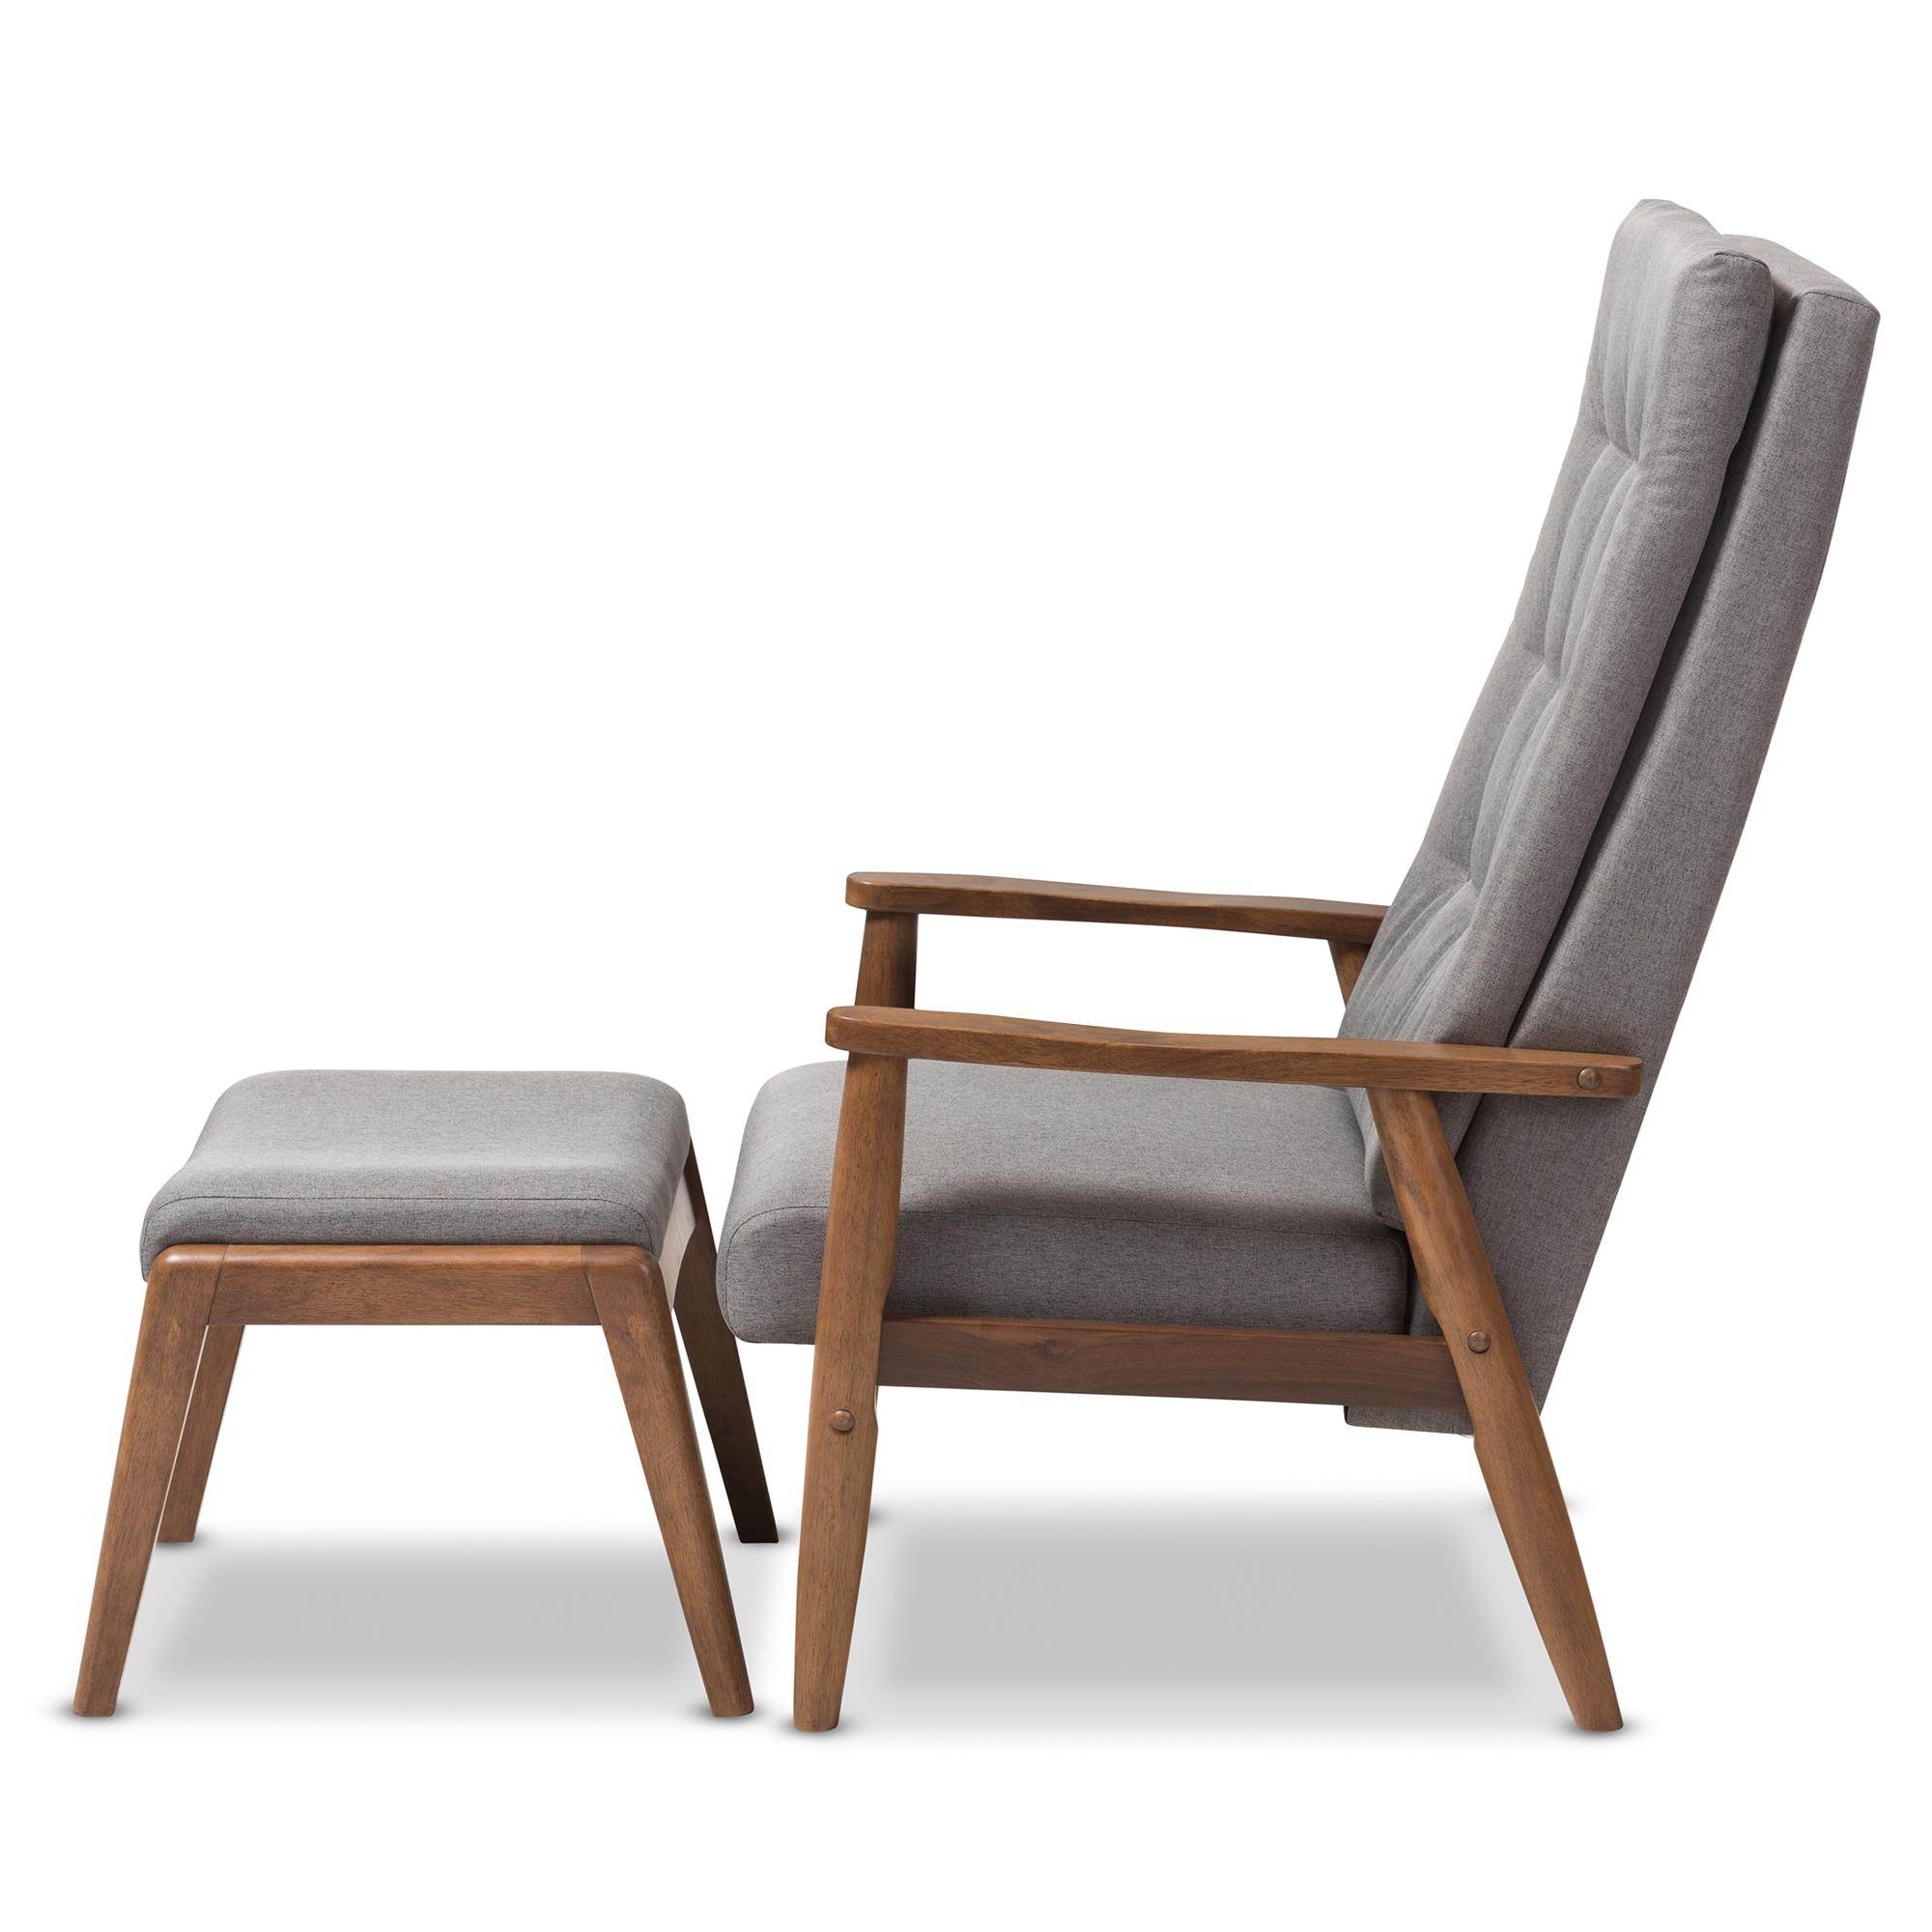 Charmant ... Baxton Studio Roxy Mid Century Modern Walnut Wood Finishing And Grey  Fabric Upholstered Button  ...